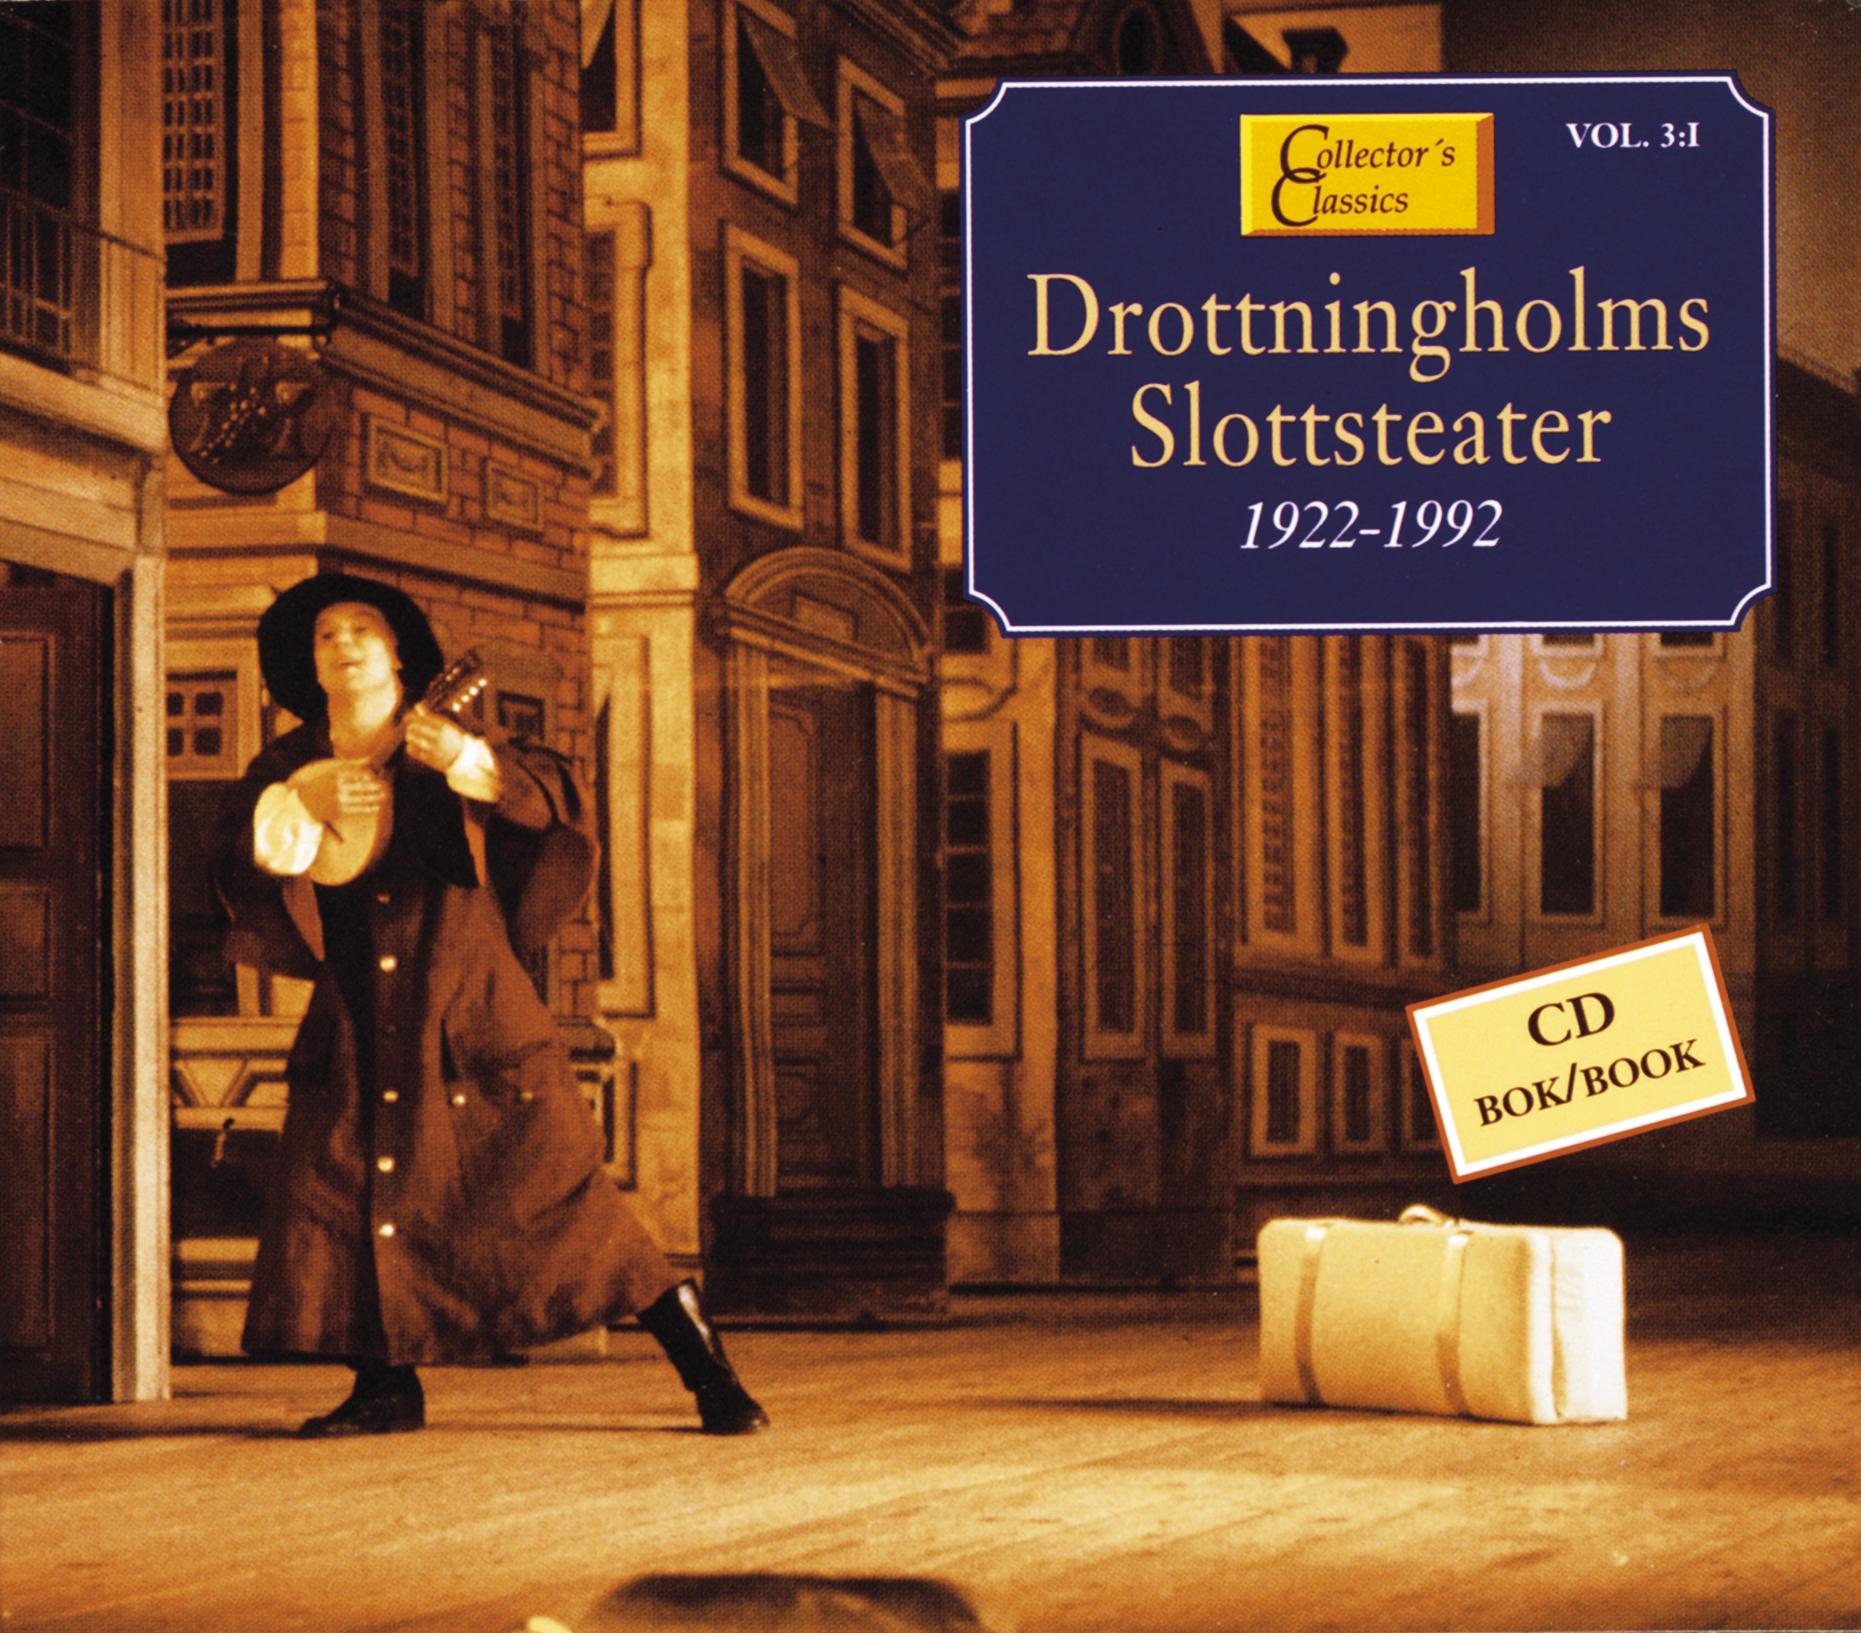 Drottningholms Slottsteater Vol. 3